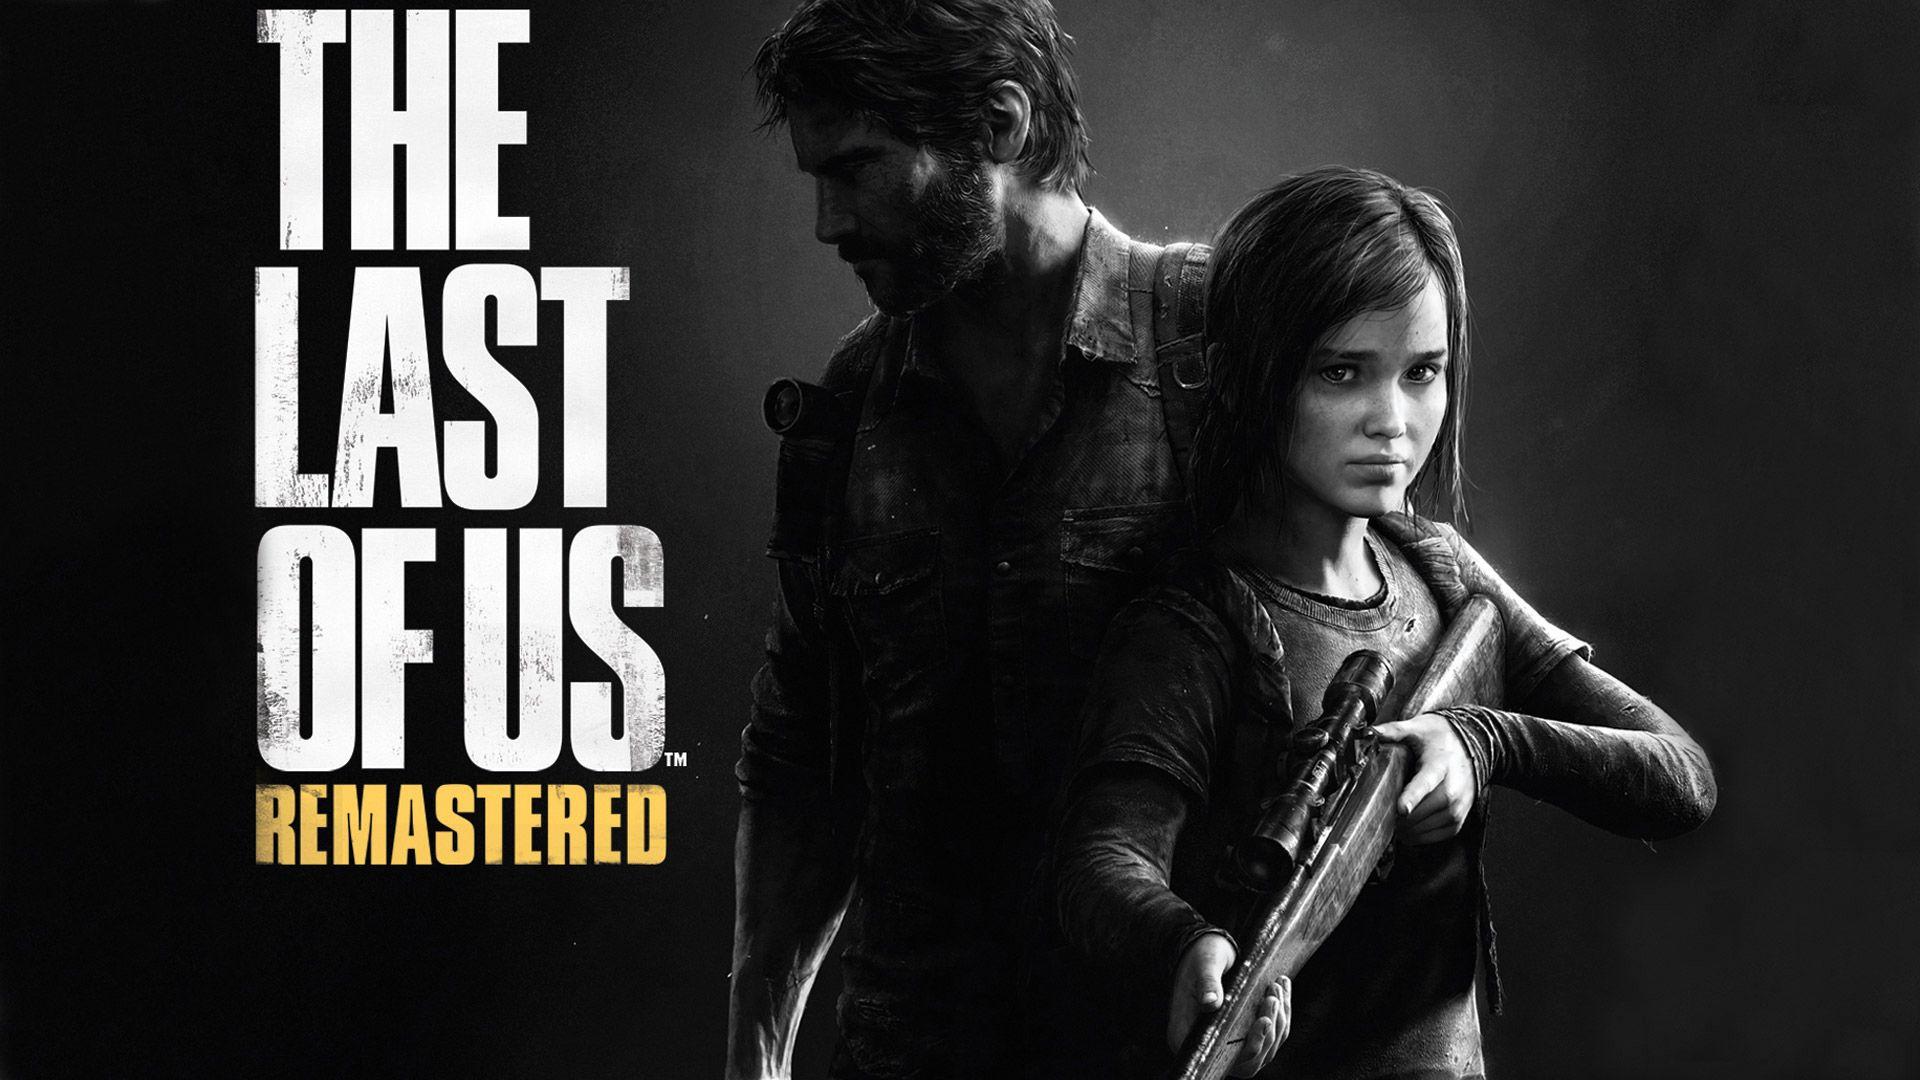 The Last Of Us Remastered Hd Desktop Wallpaper High Definition